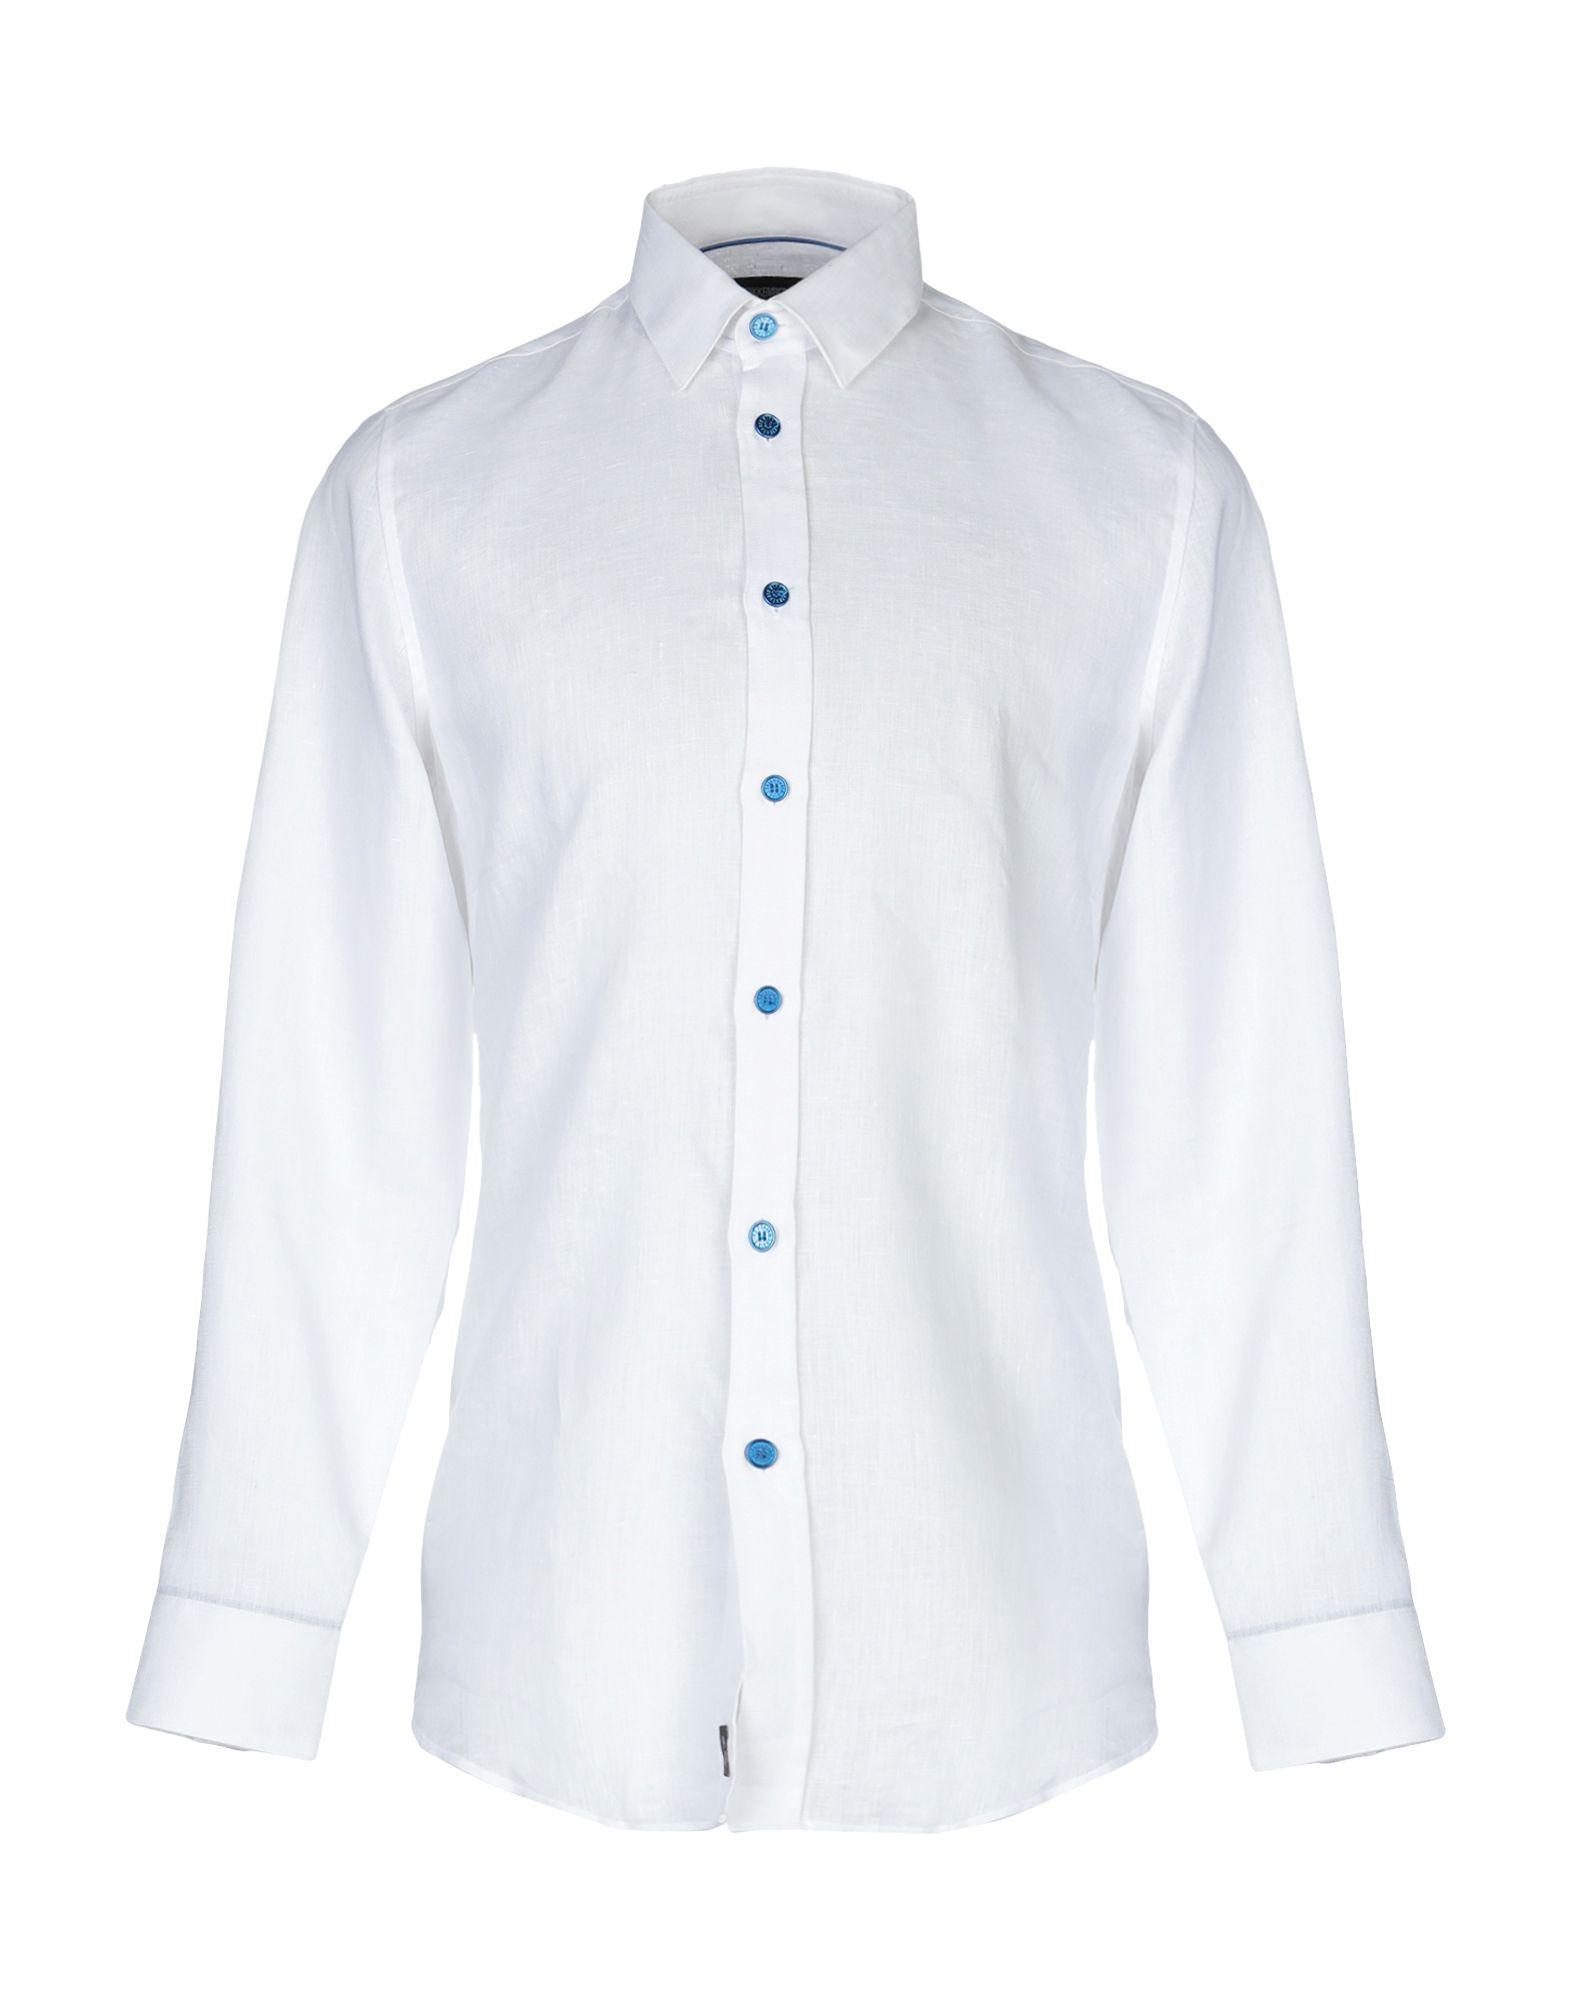 все цены на DIRK BIKKEMBERGS Pубашка онлайн